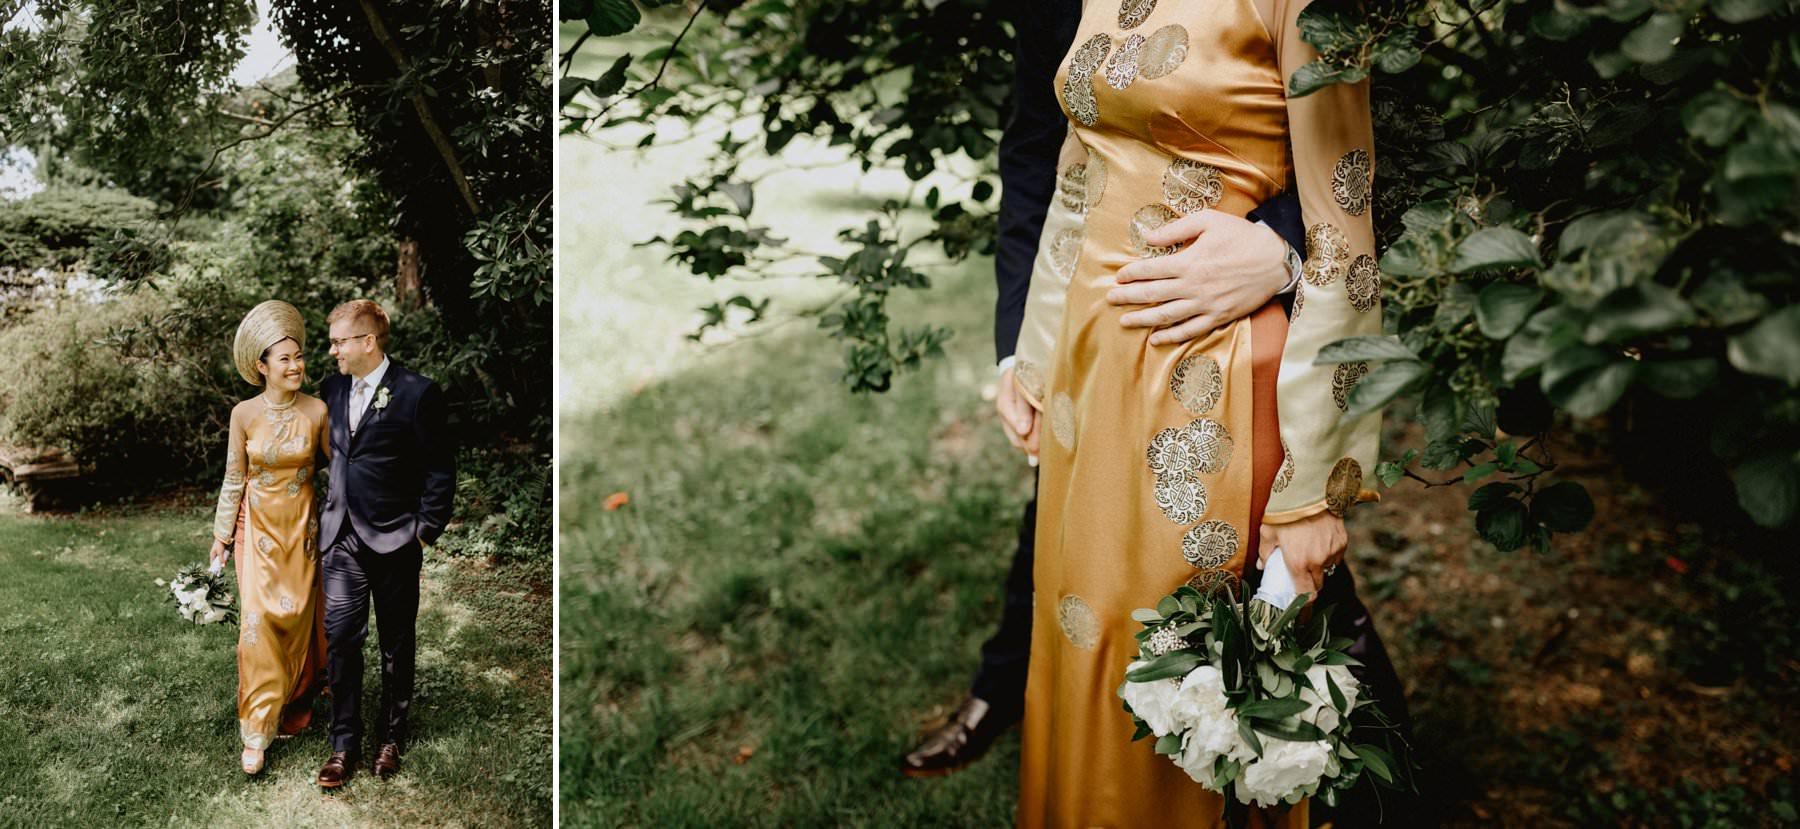 Appleford-estate-wedding-31.jpg